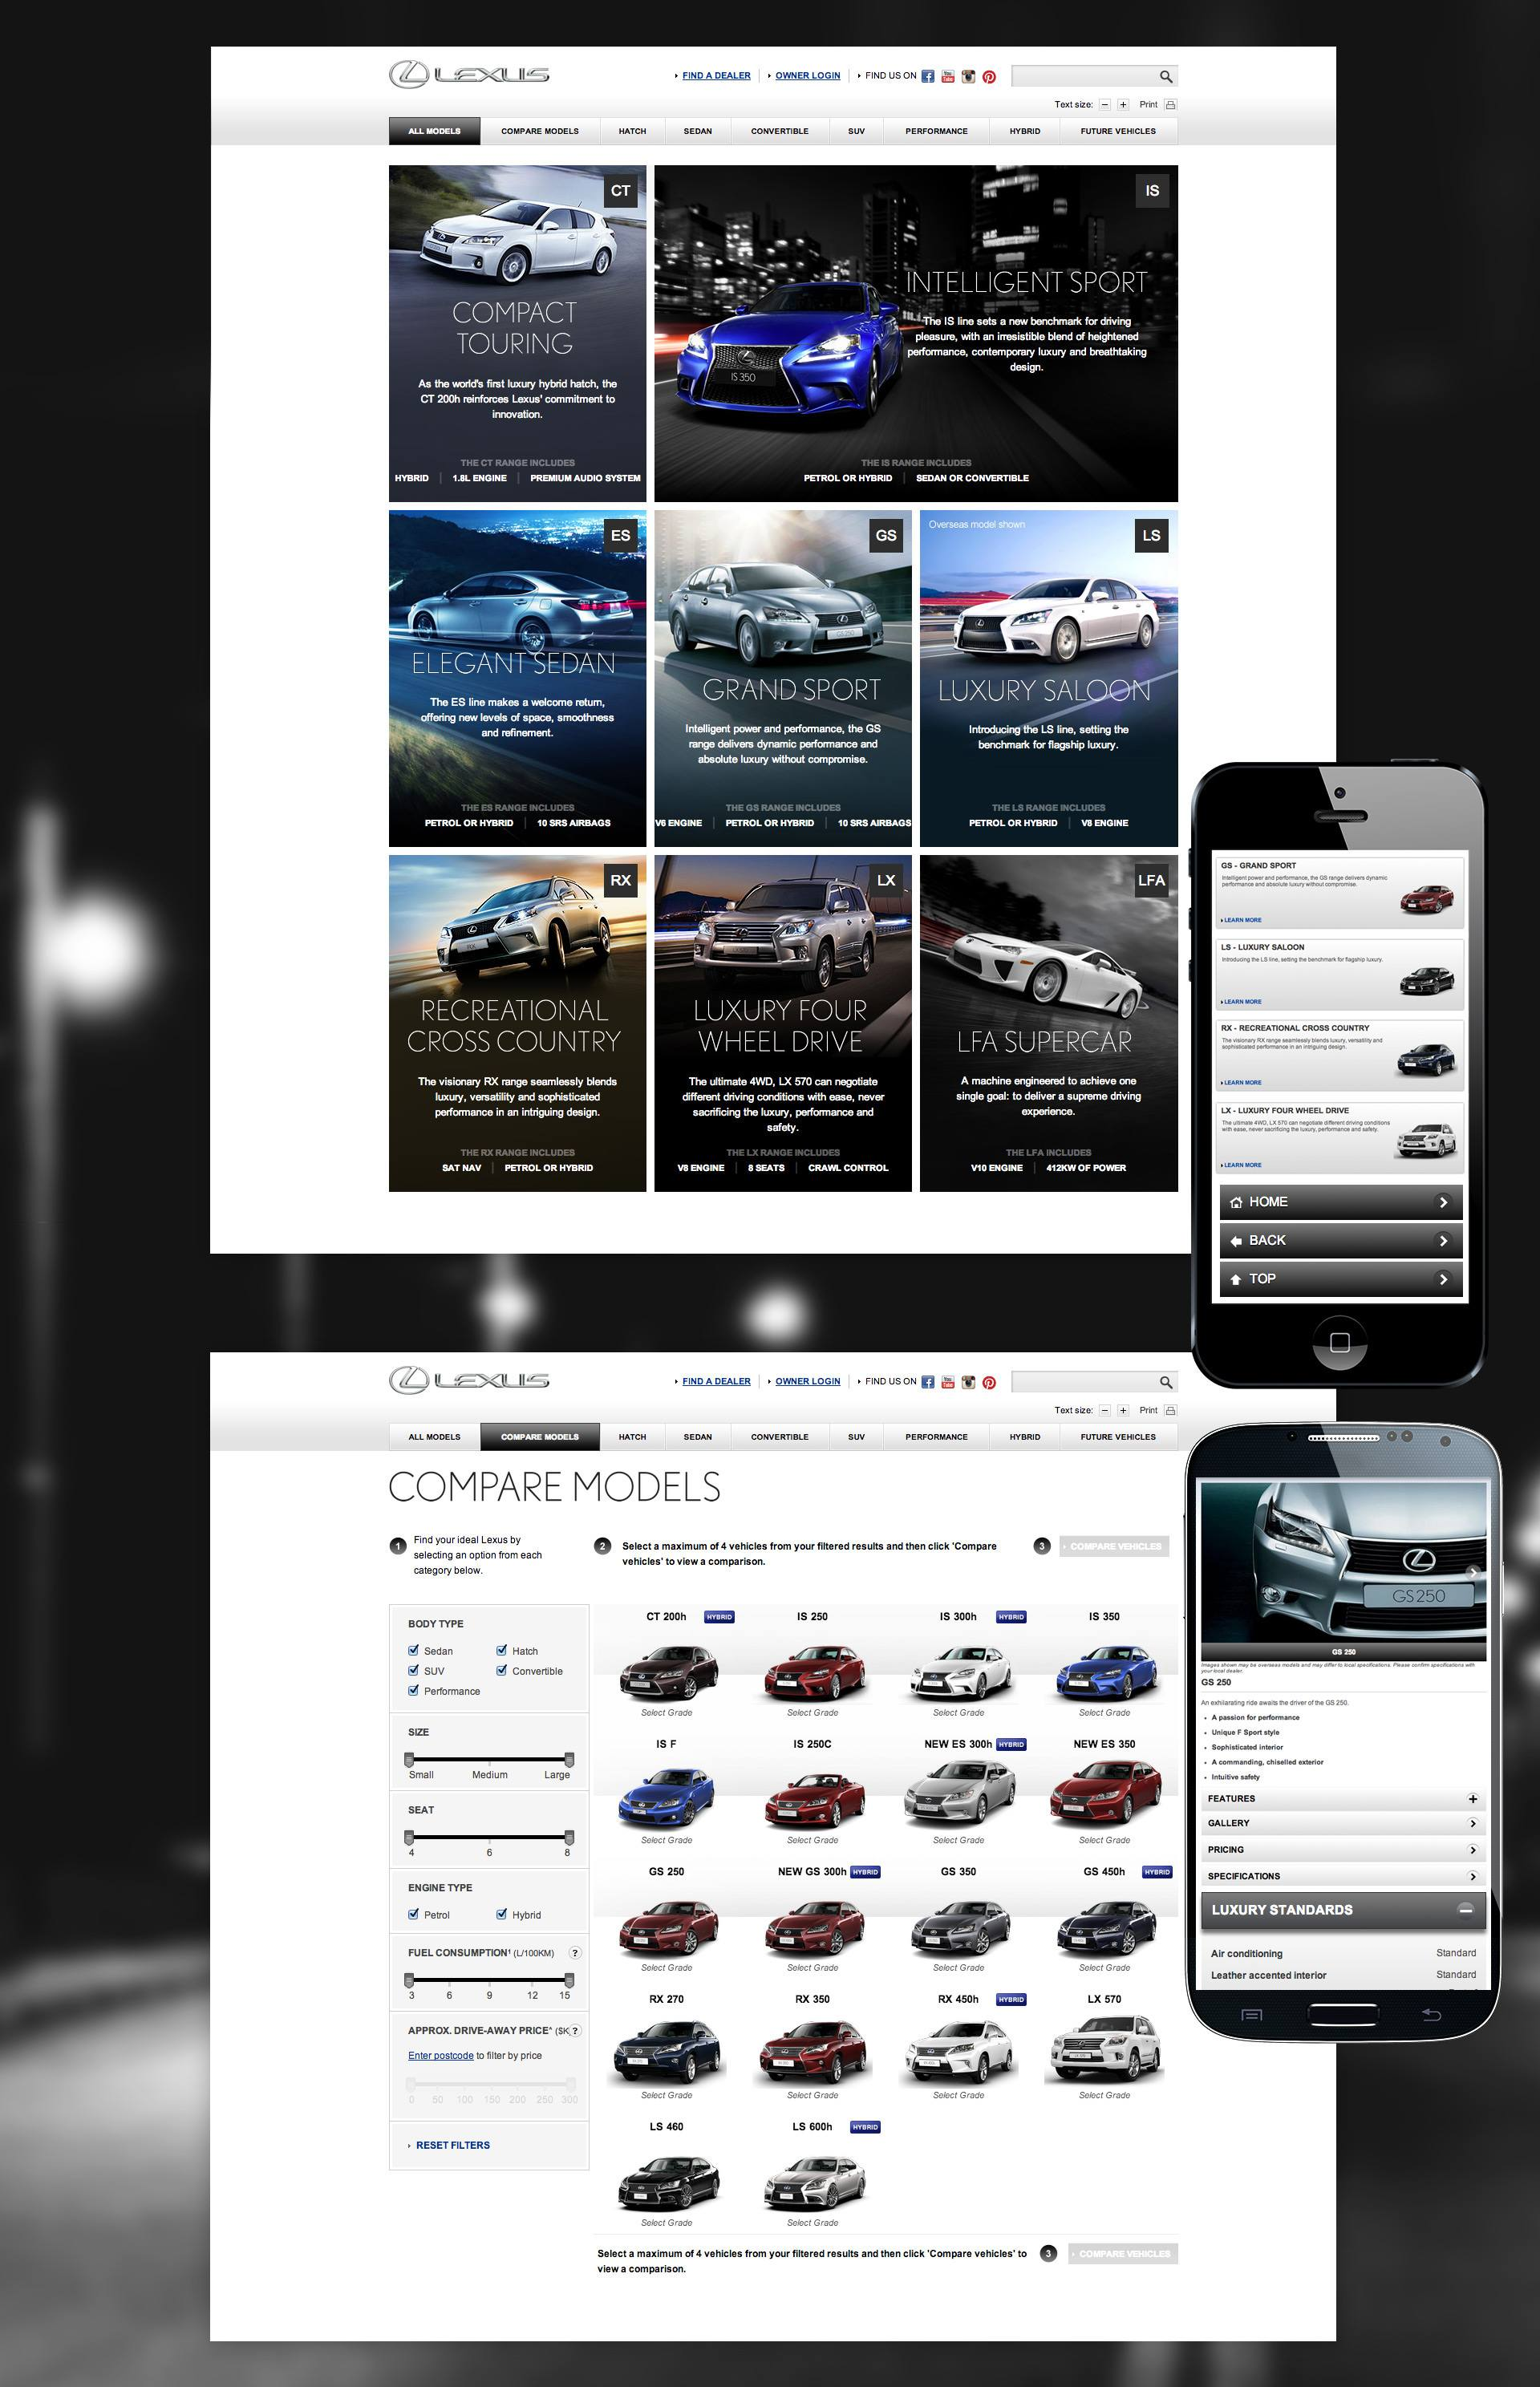 53d9e6db10e86006055470c6_Lexus-Project-Part2-v2.jpg